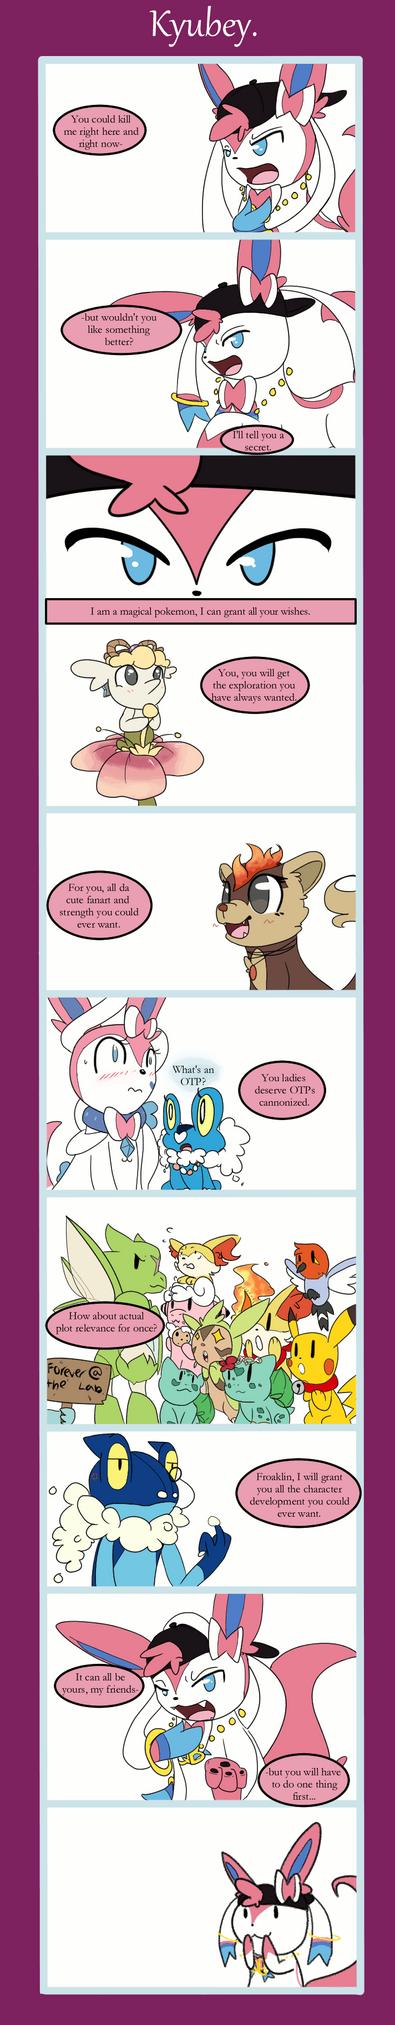 A Kyubey comic by Multiworx